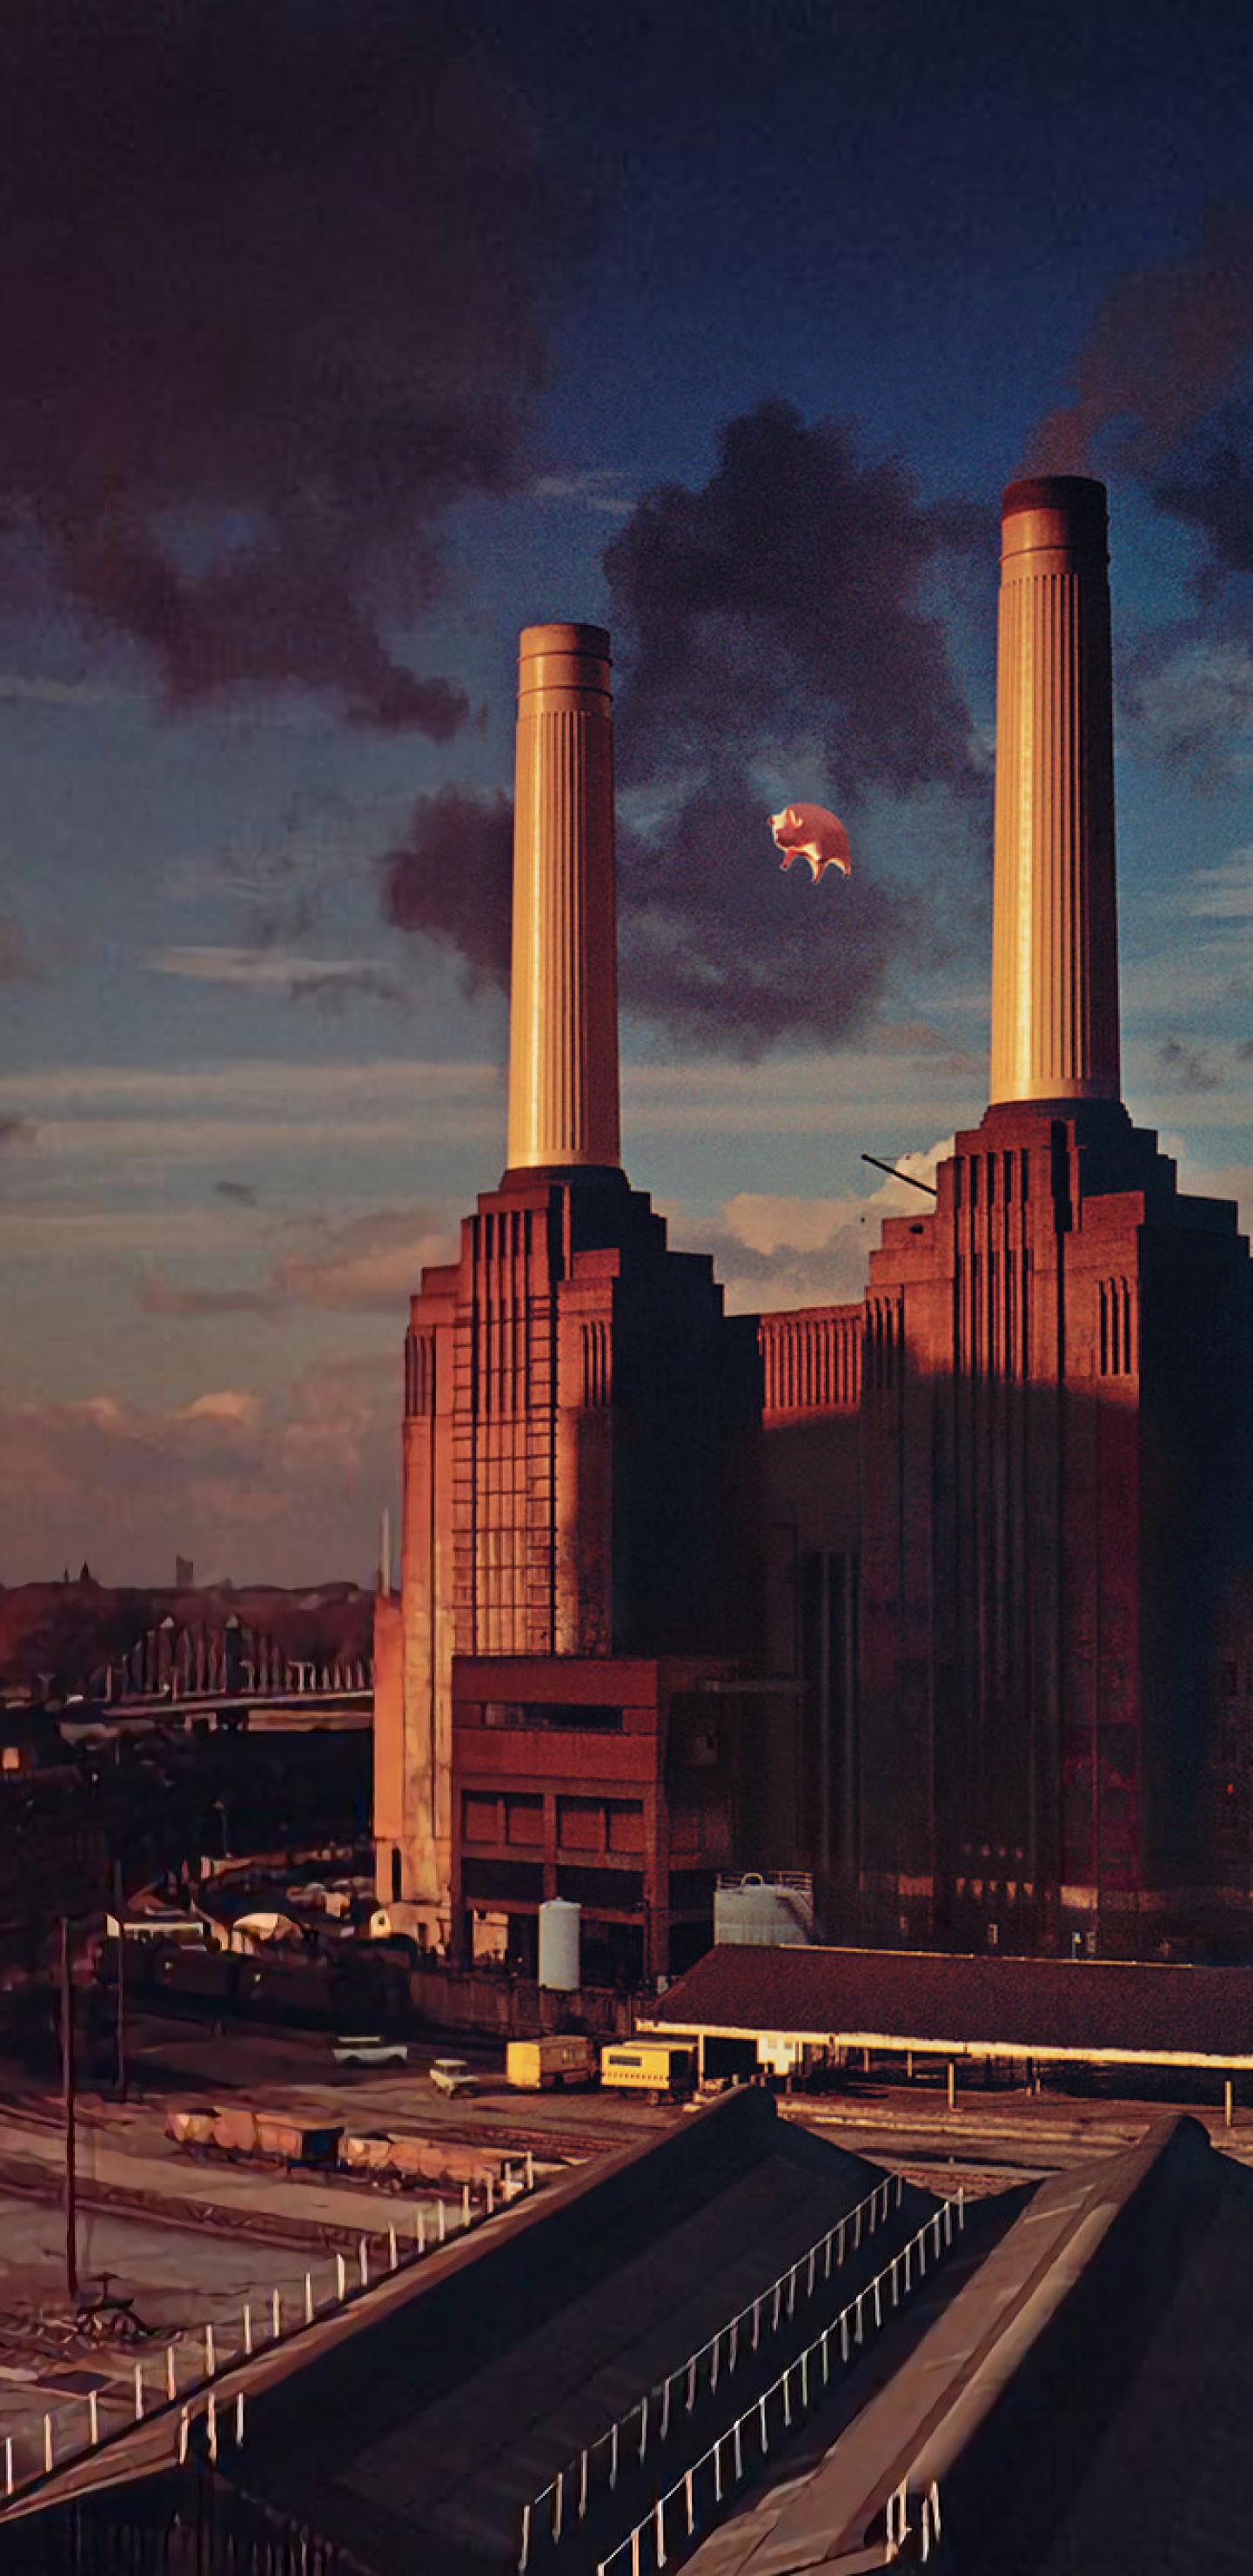 1440x2960 Pink Floyd Animals Album Cover Samsung Galaxy Note 9 8